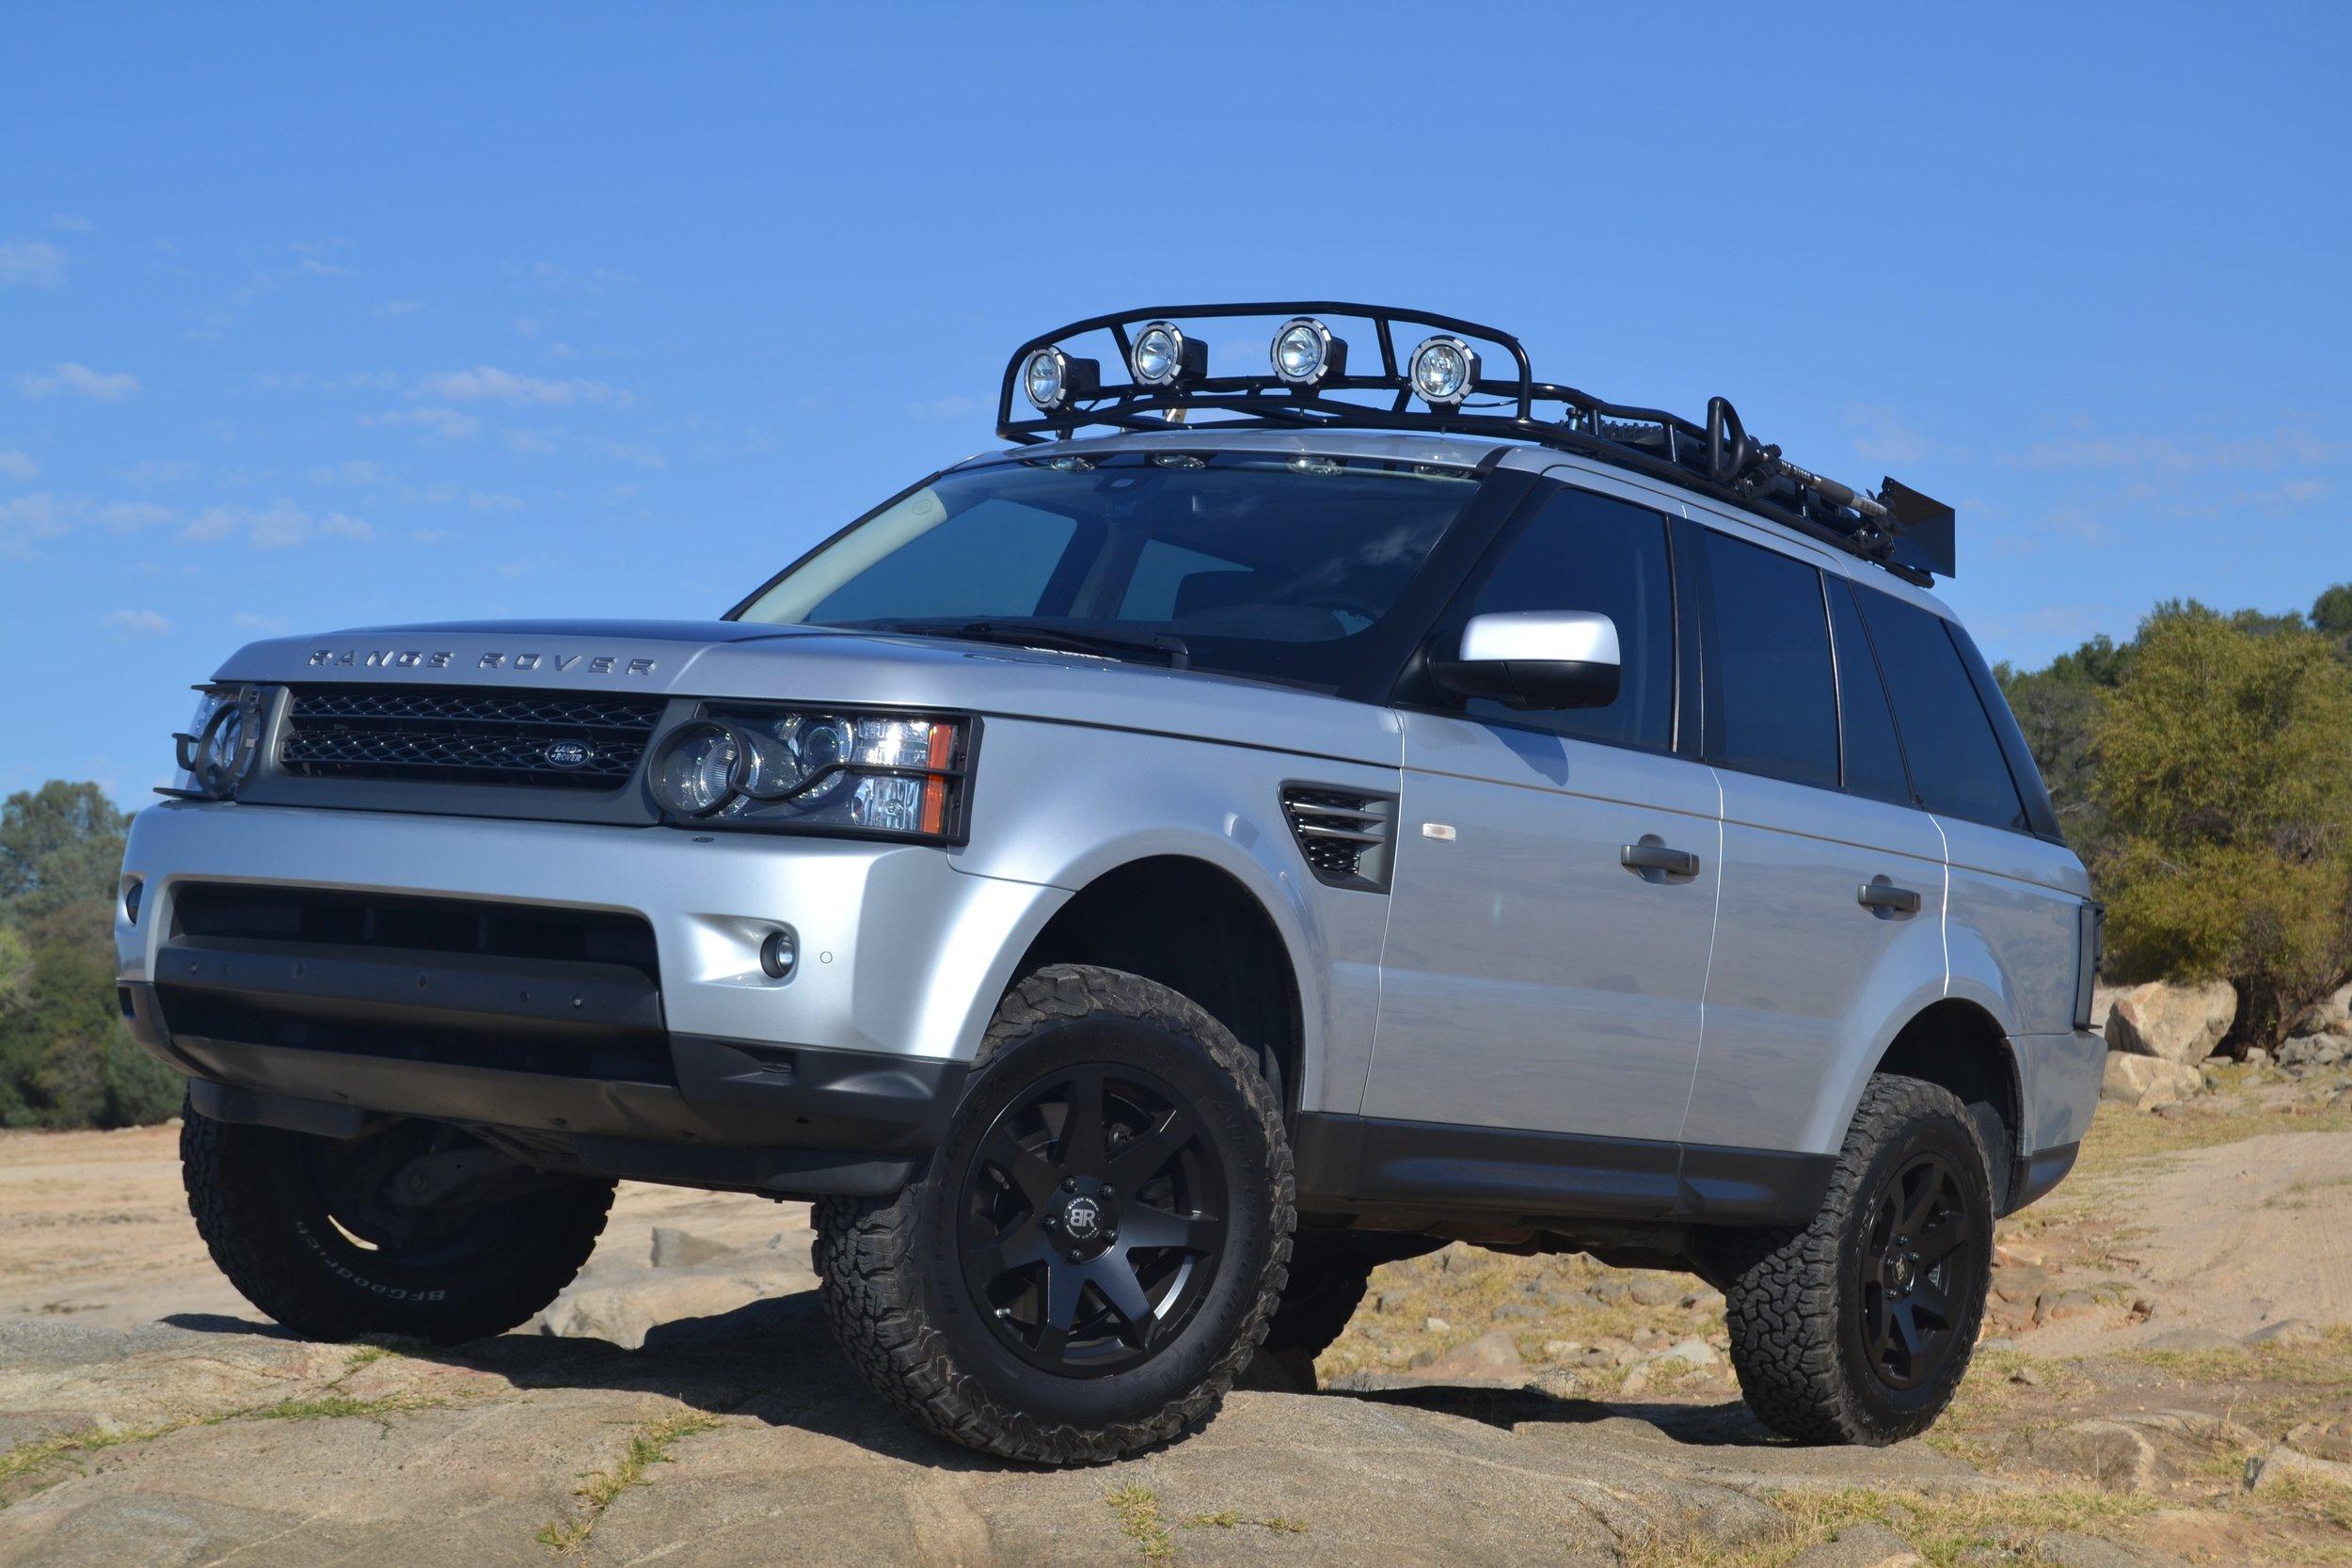 Range-Rover-Sport-Offroad-Challenge-Voyager-Rack